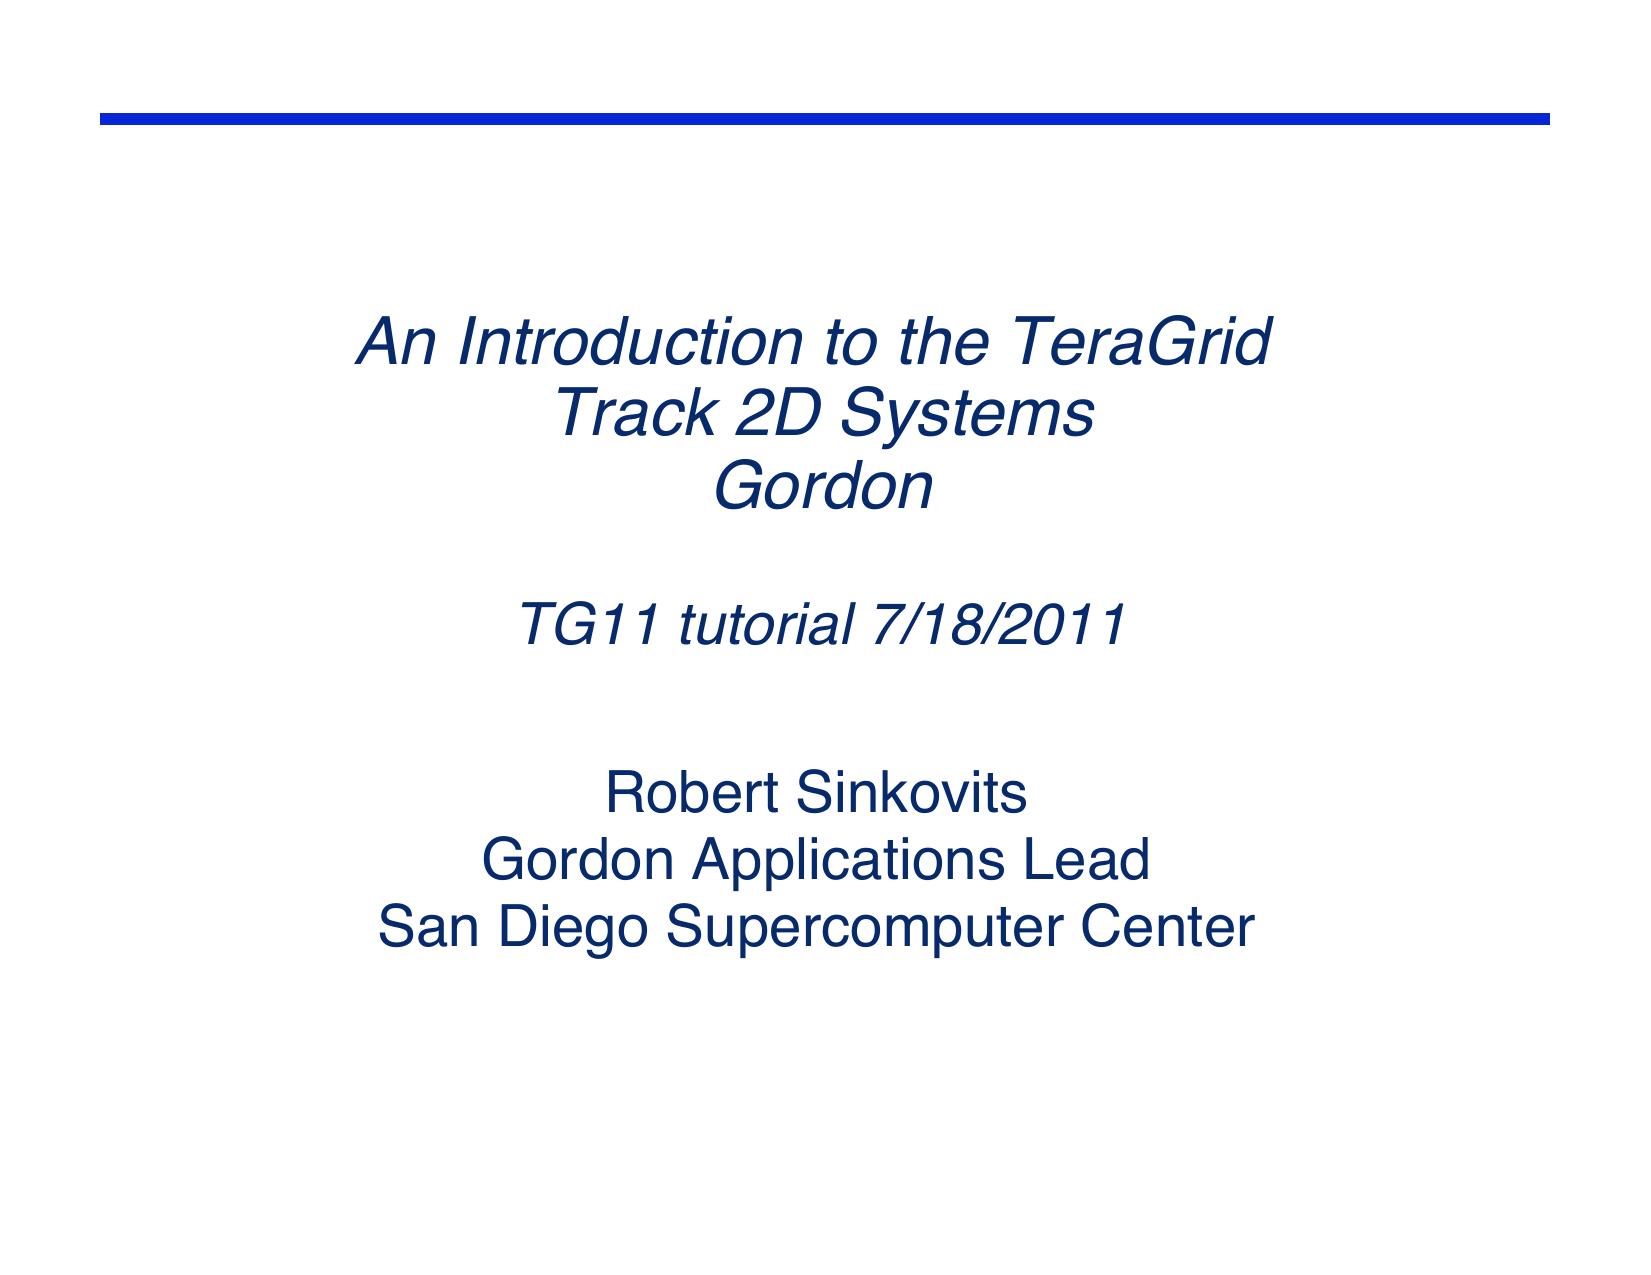 TG11 Track2D Gordon Tutorial - San Diego Supercomputer Center